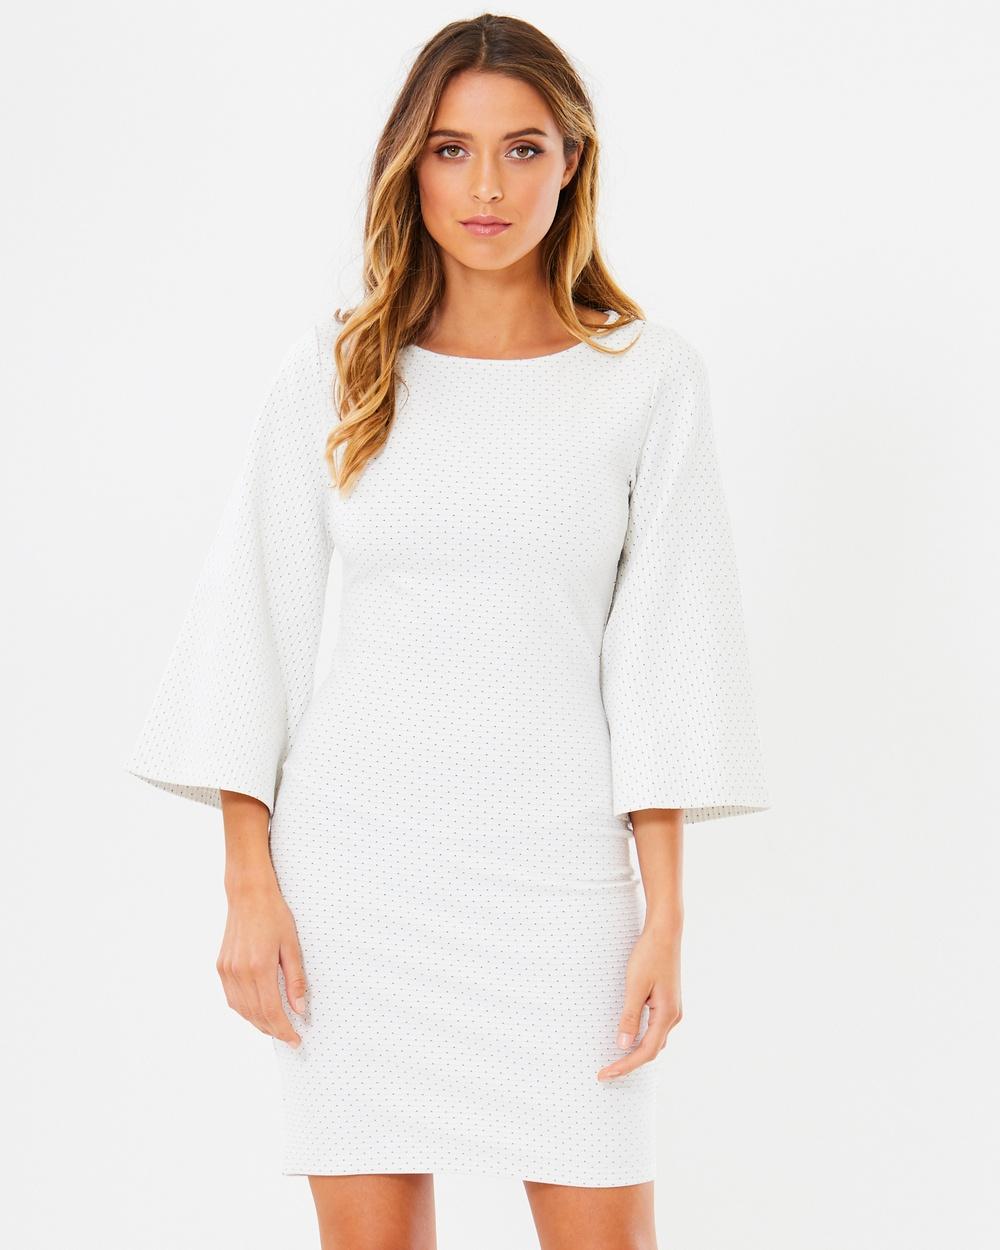 Tussah Gabrielle Bodycon Dress Dresses White Base Spot Gabrielle Bodycon Dress